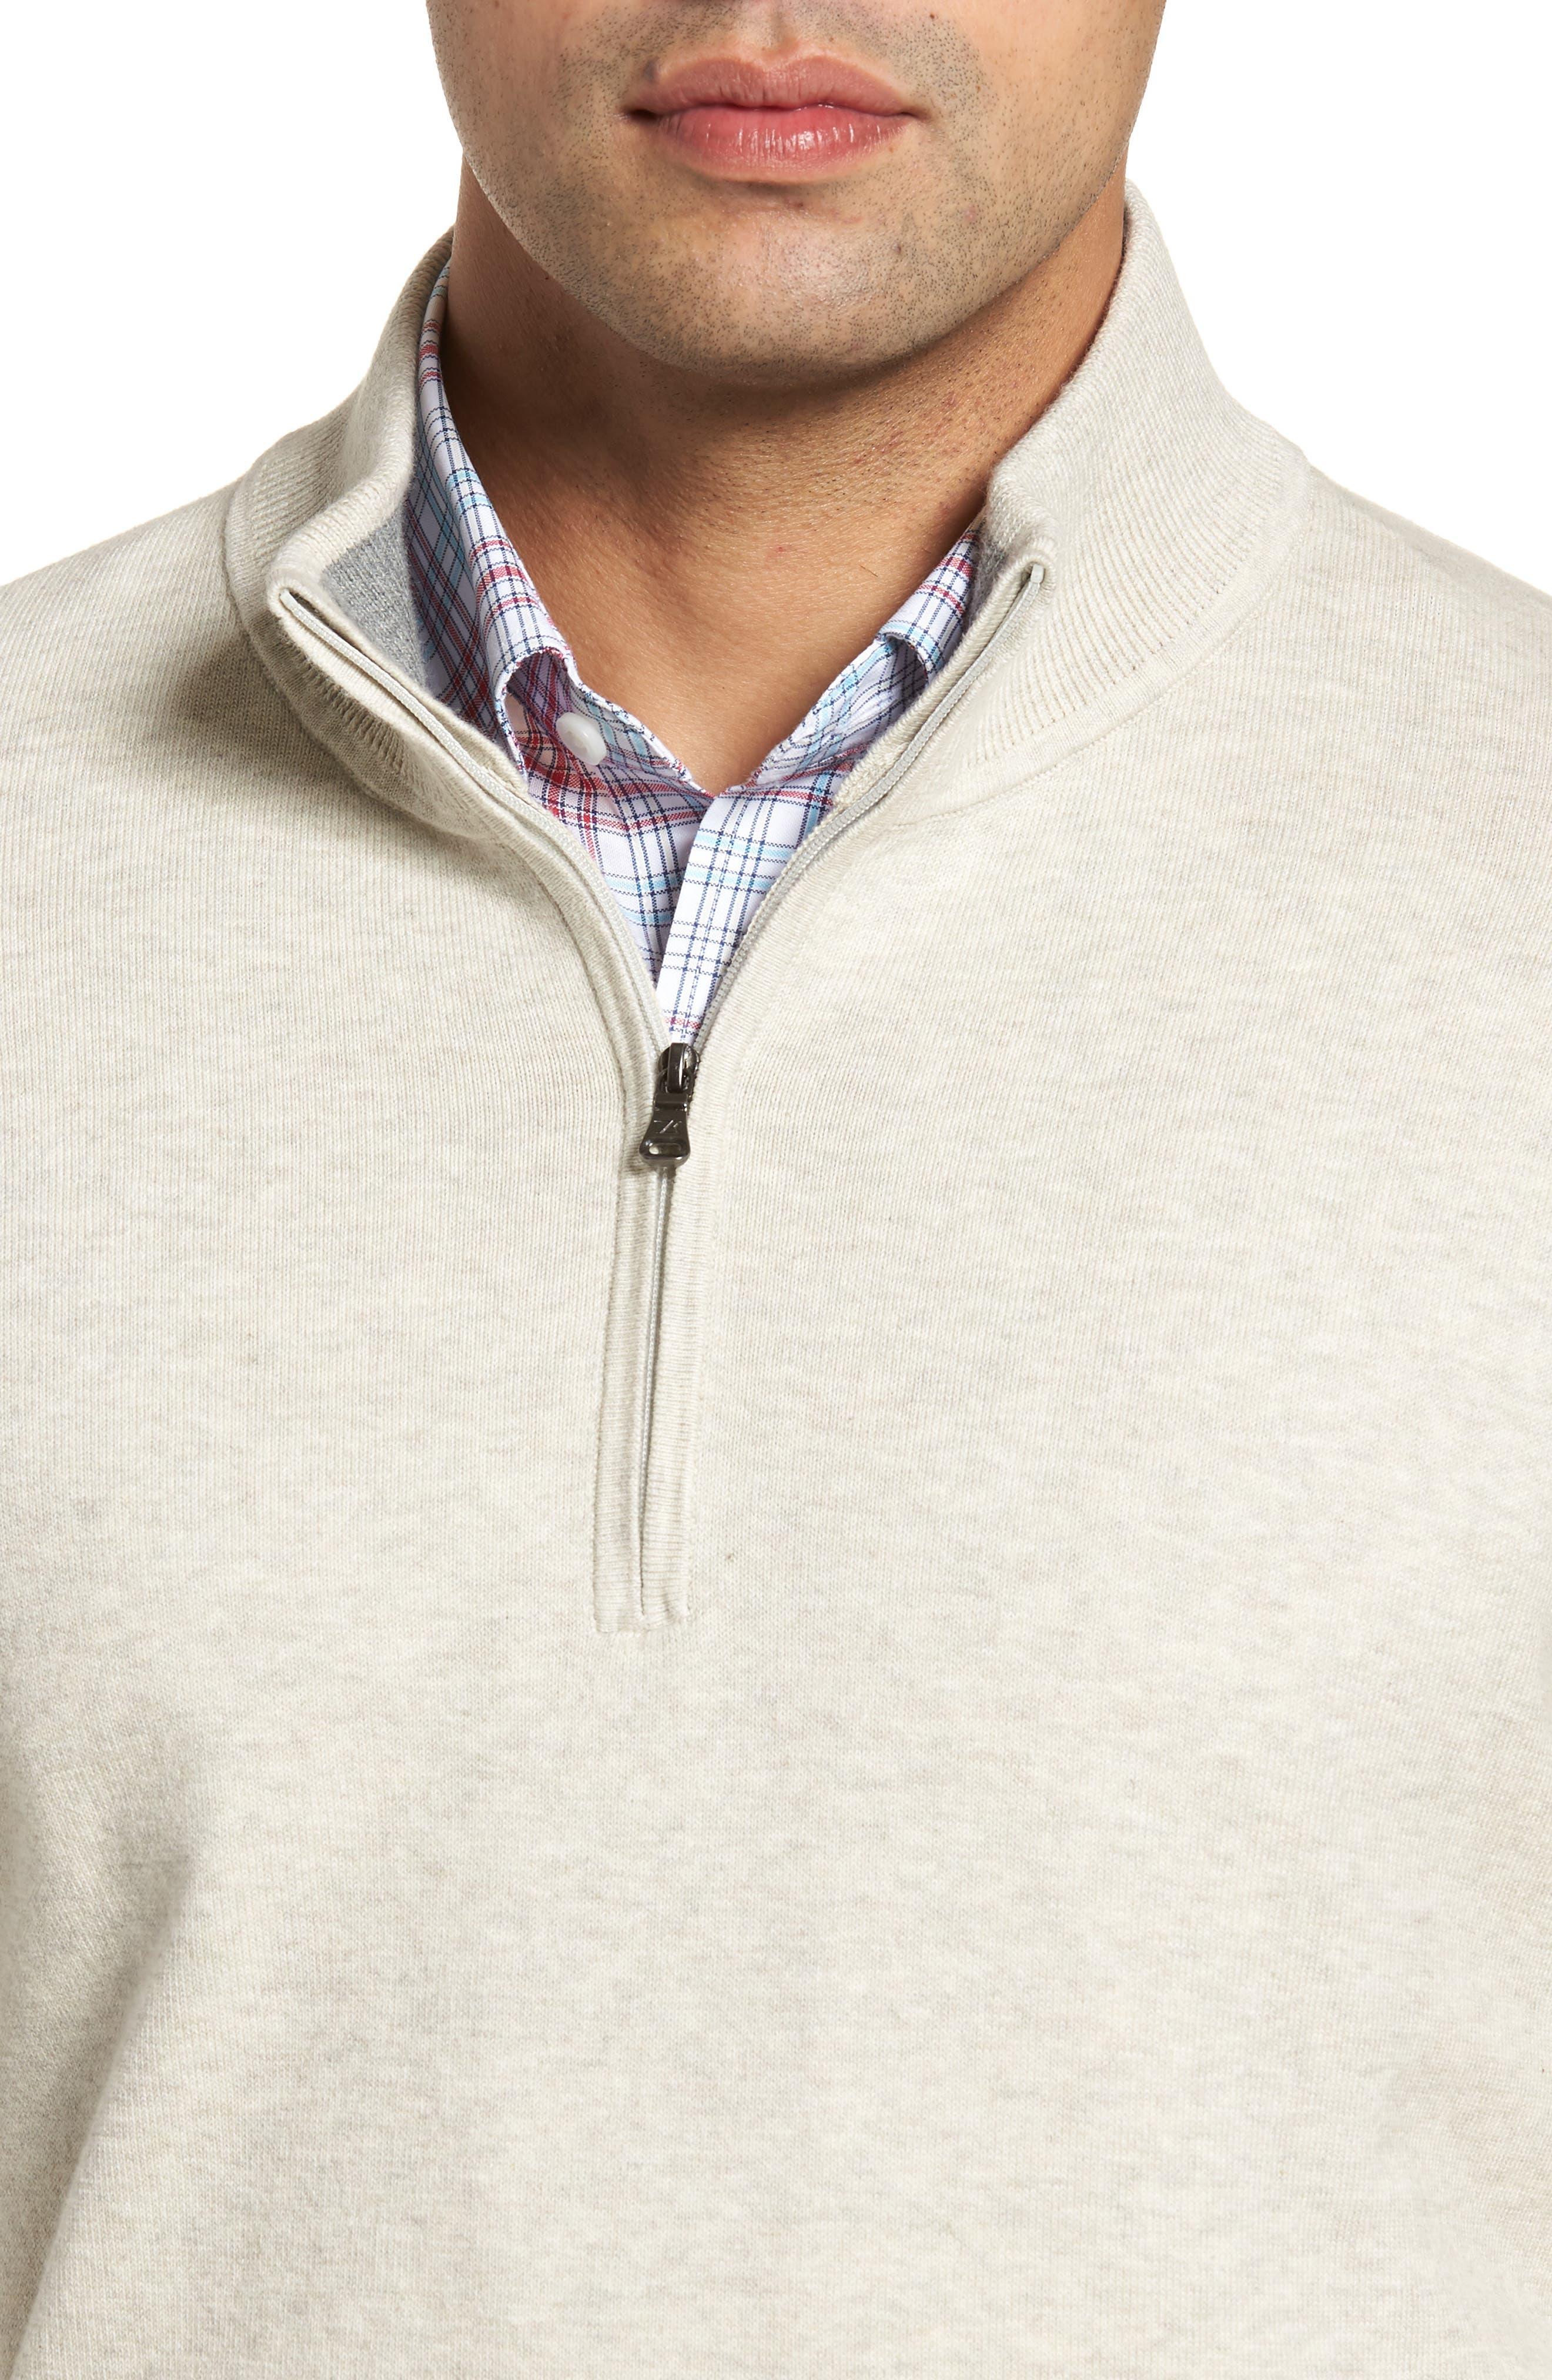 CUTTER & BUCK,                             Lakemont Classic Fit Quarter Zip Sweater,                             Alternate thumbnail 4, color,                             OATMEAL HEATHER